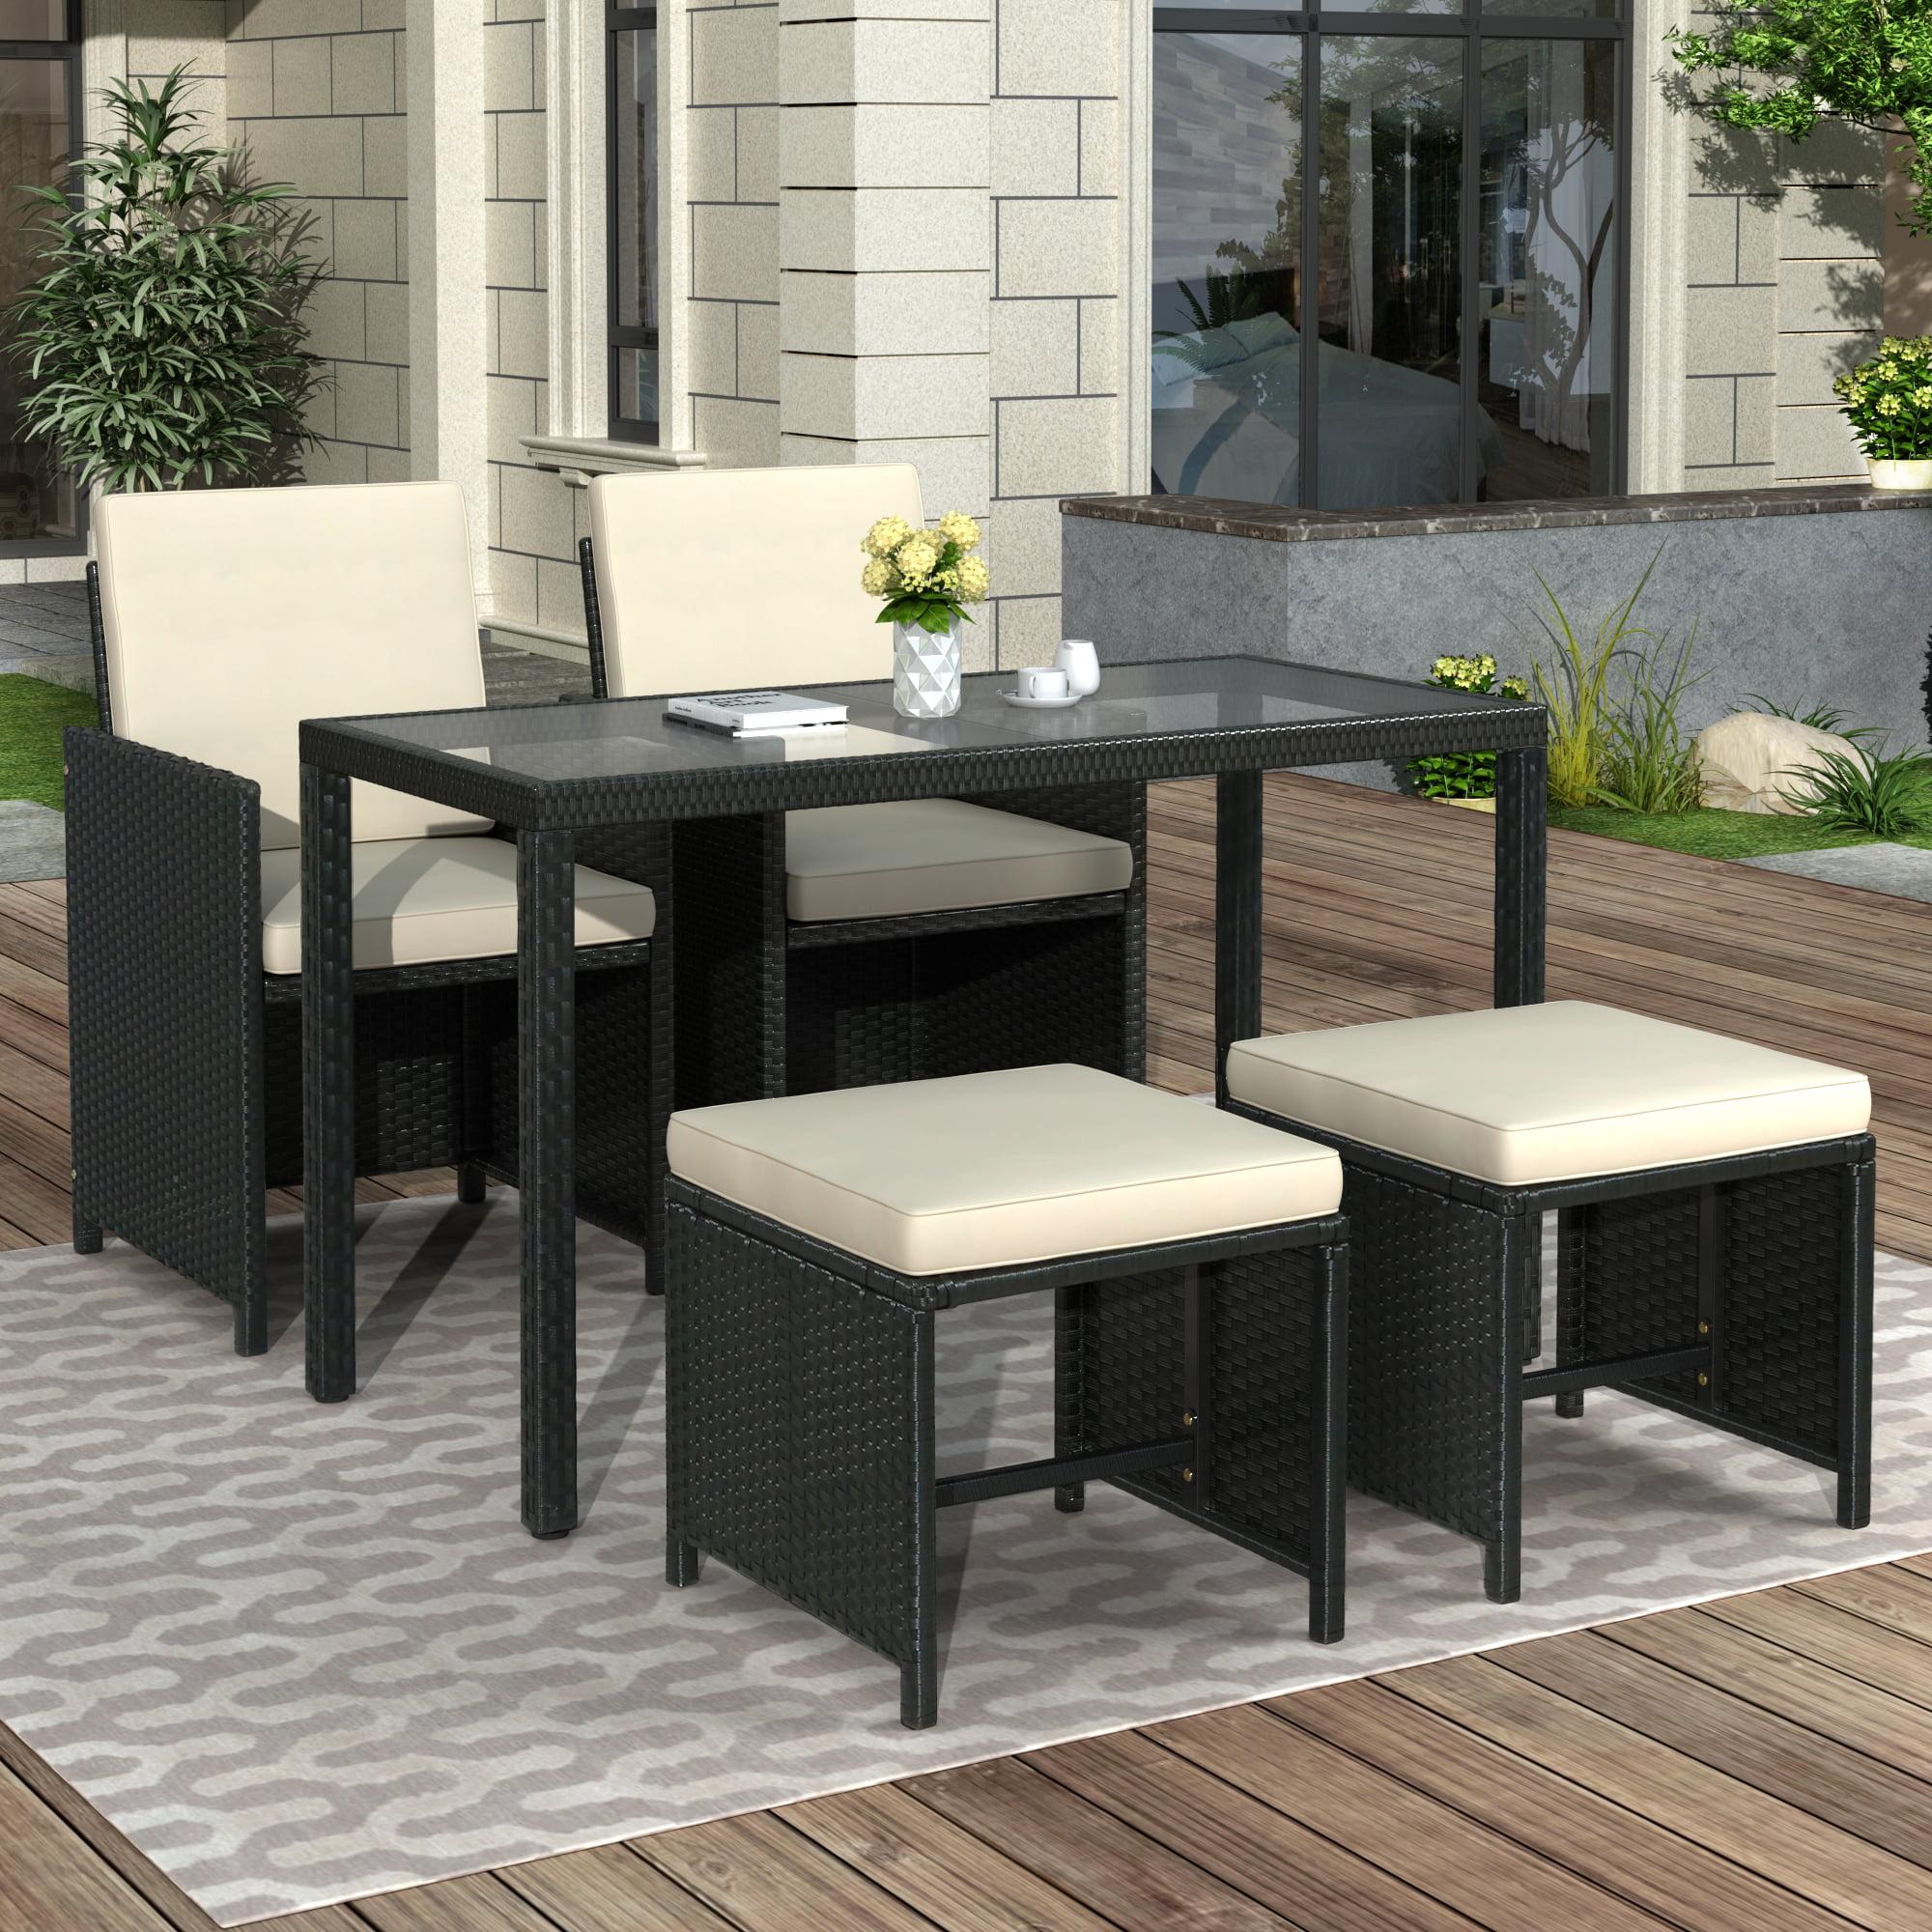 enyopro 5 Piece Patio Furniture Dining Set, Outdoor Rattan ...